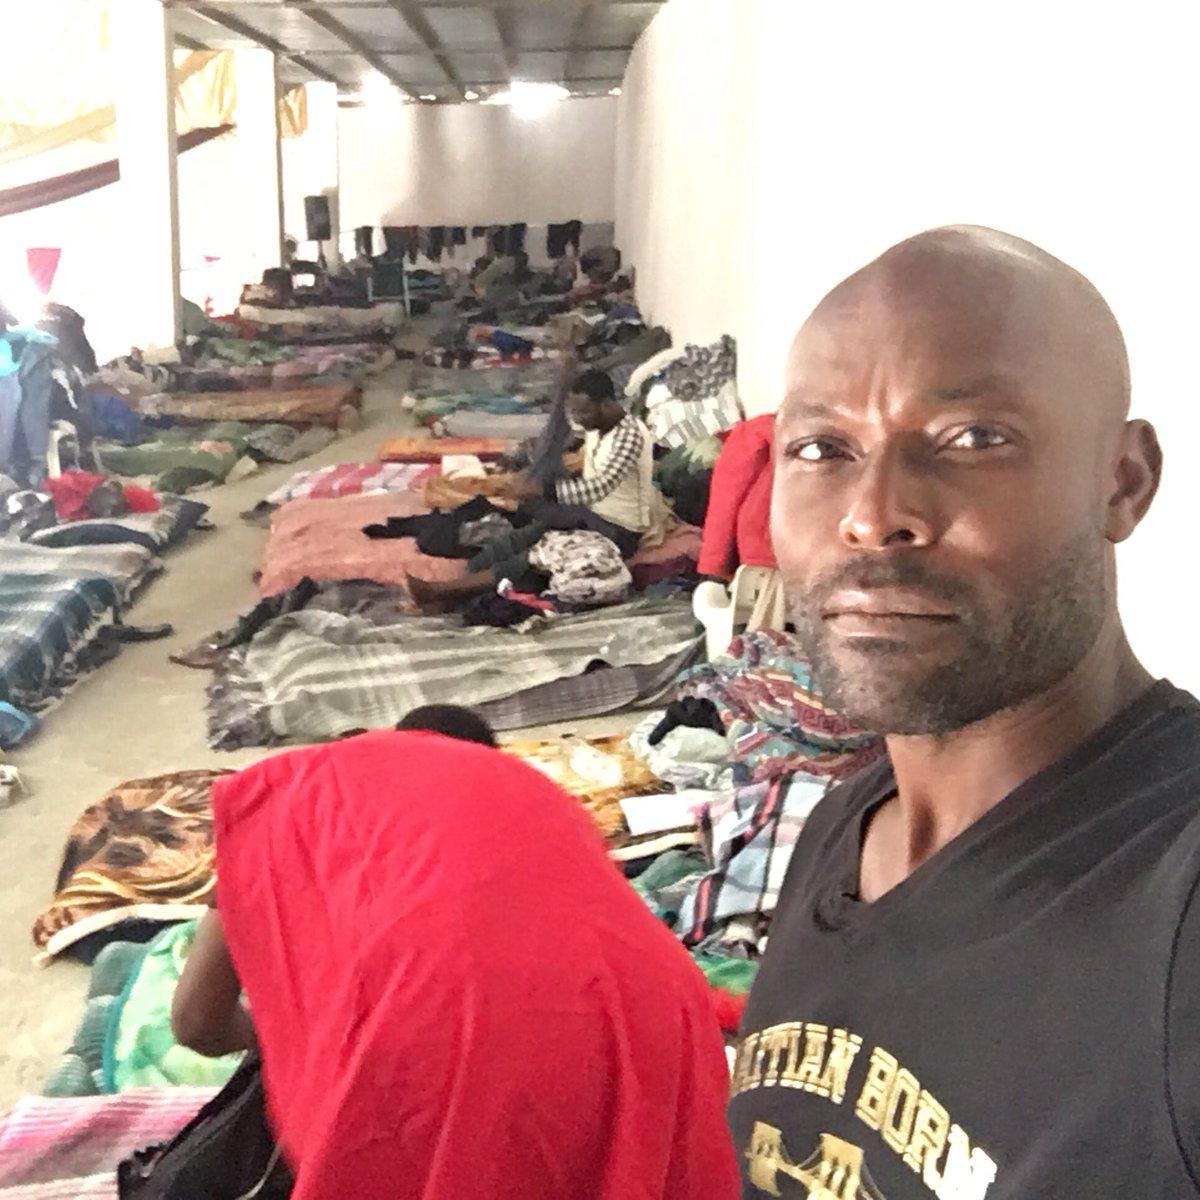 haitians-trapped-in-mexico-jimmy-jean-louis-twitter-althaitians-trapped-in-mexico-jimmy-jean-louis-twitter-alt